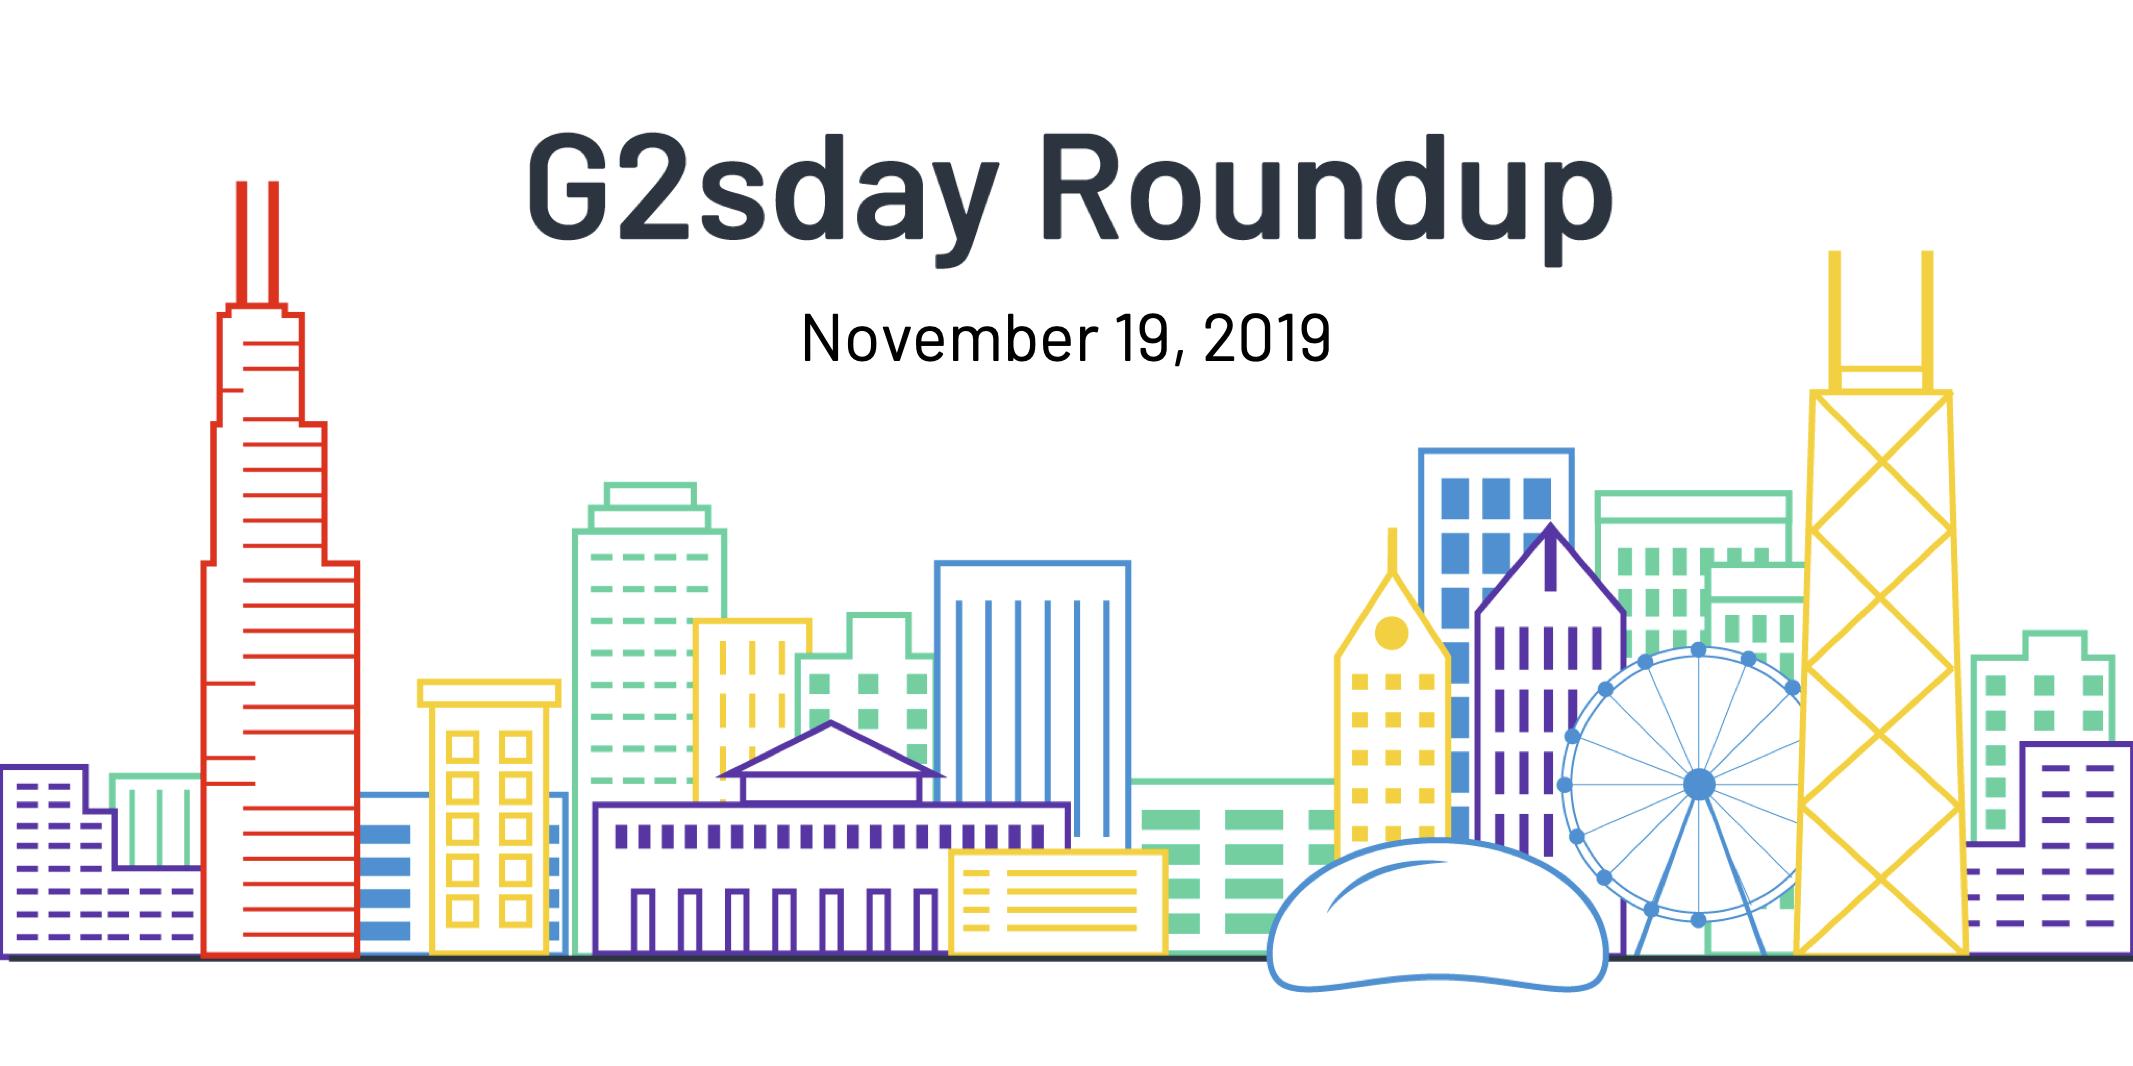 G2sday Roundup 11.19.19